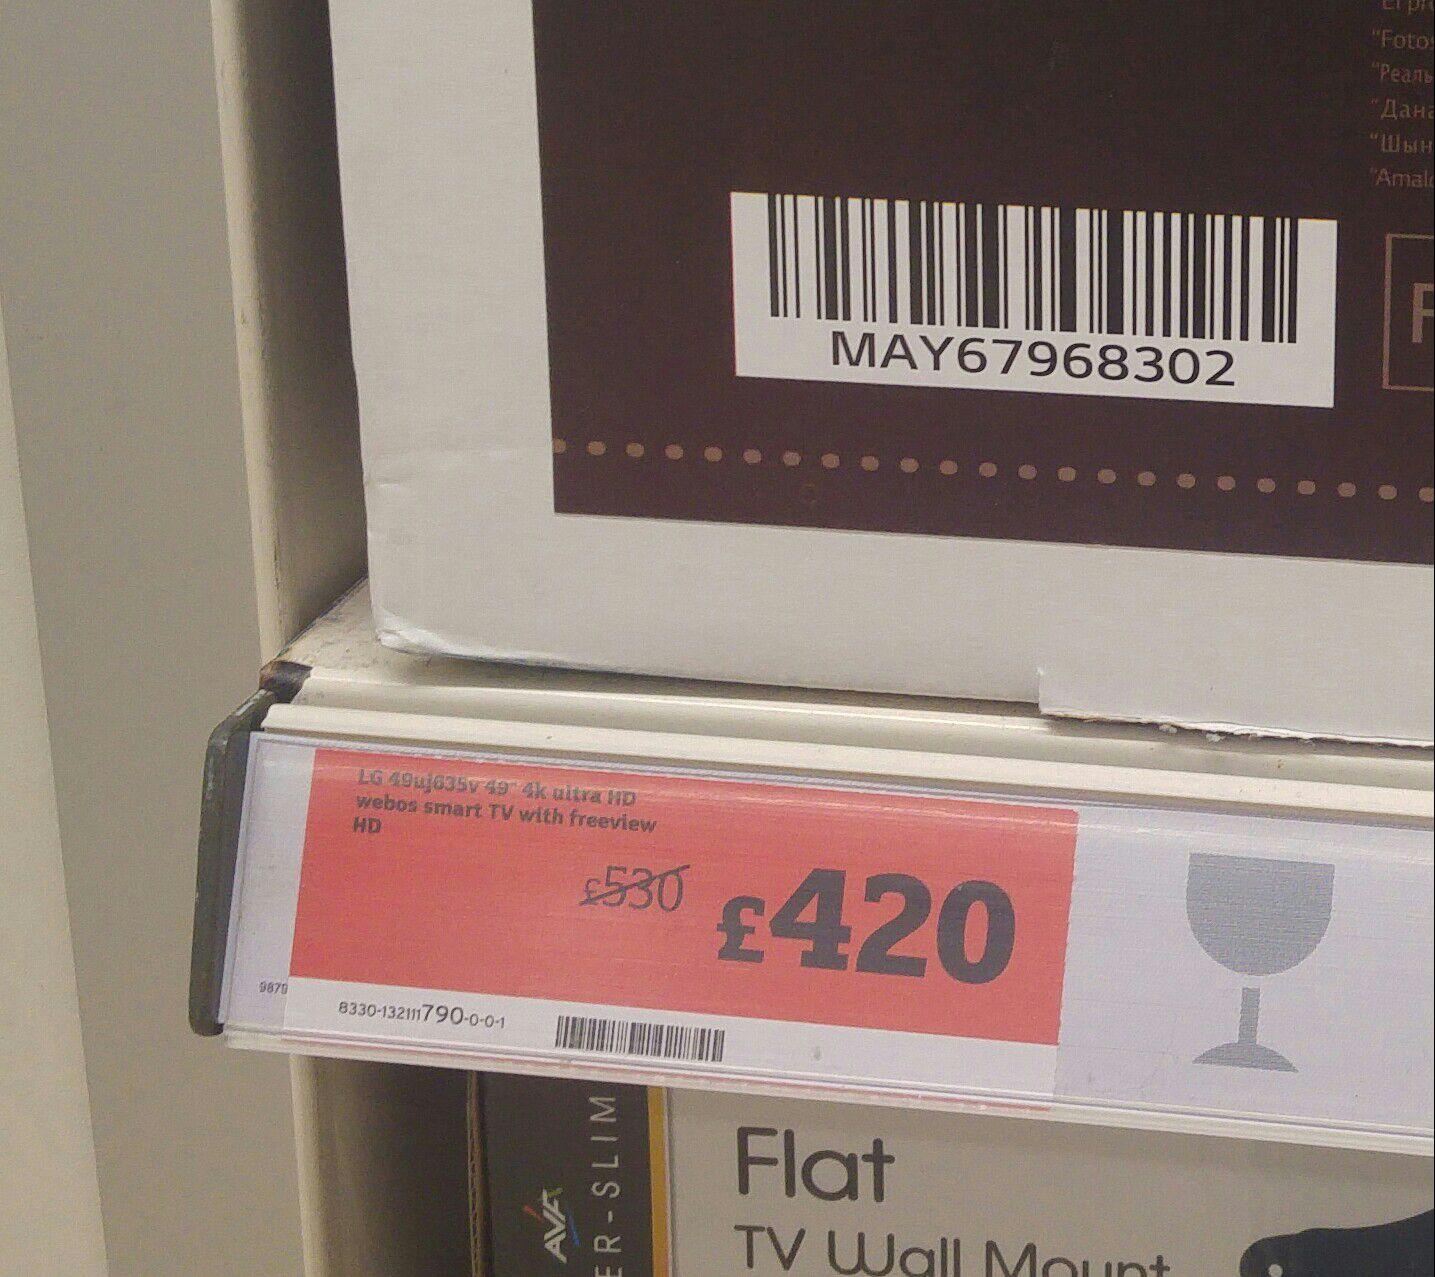 LG 49UJ635V 49 inch 4K ultra HD HDR Smart LED TV £420 in Sainsbury's, East Kilbride